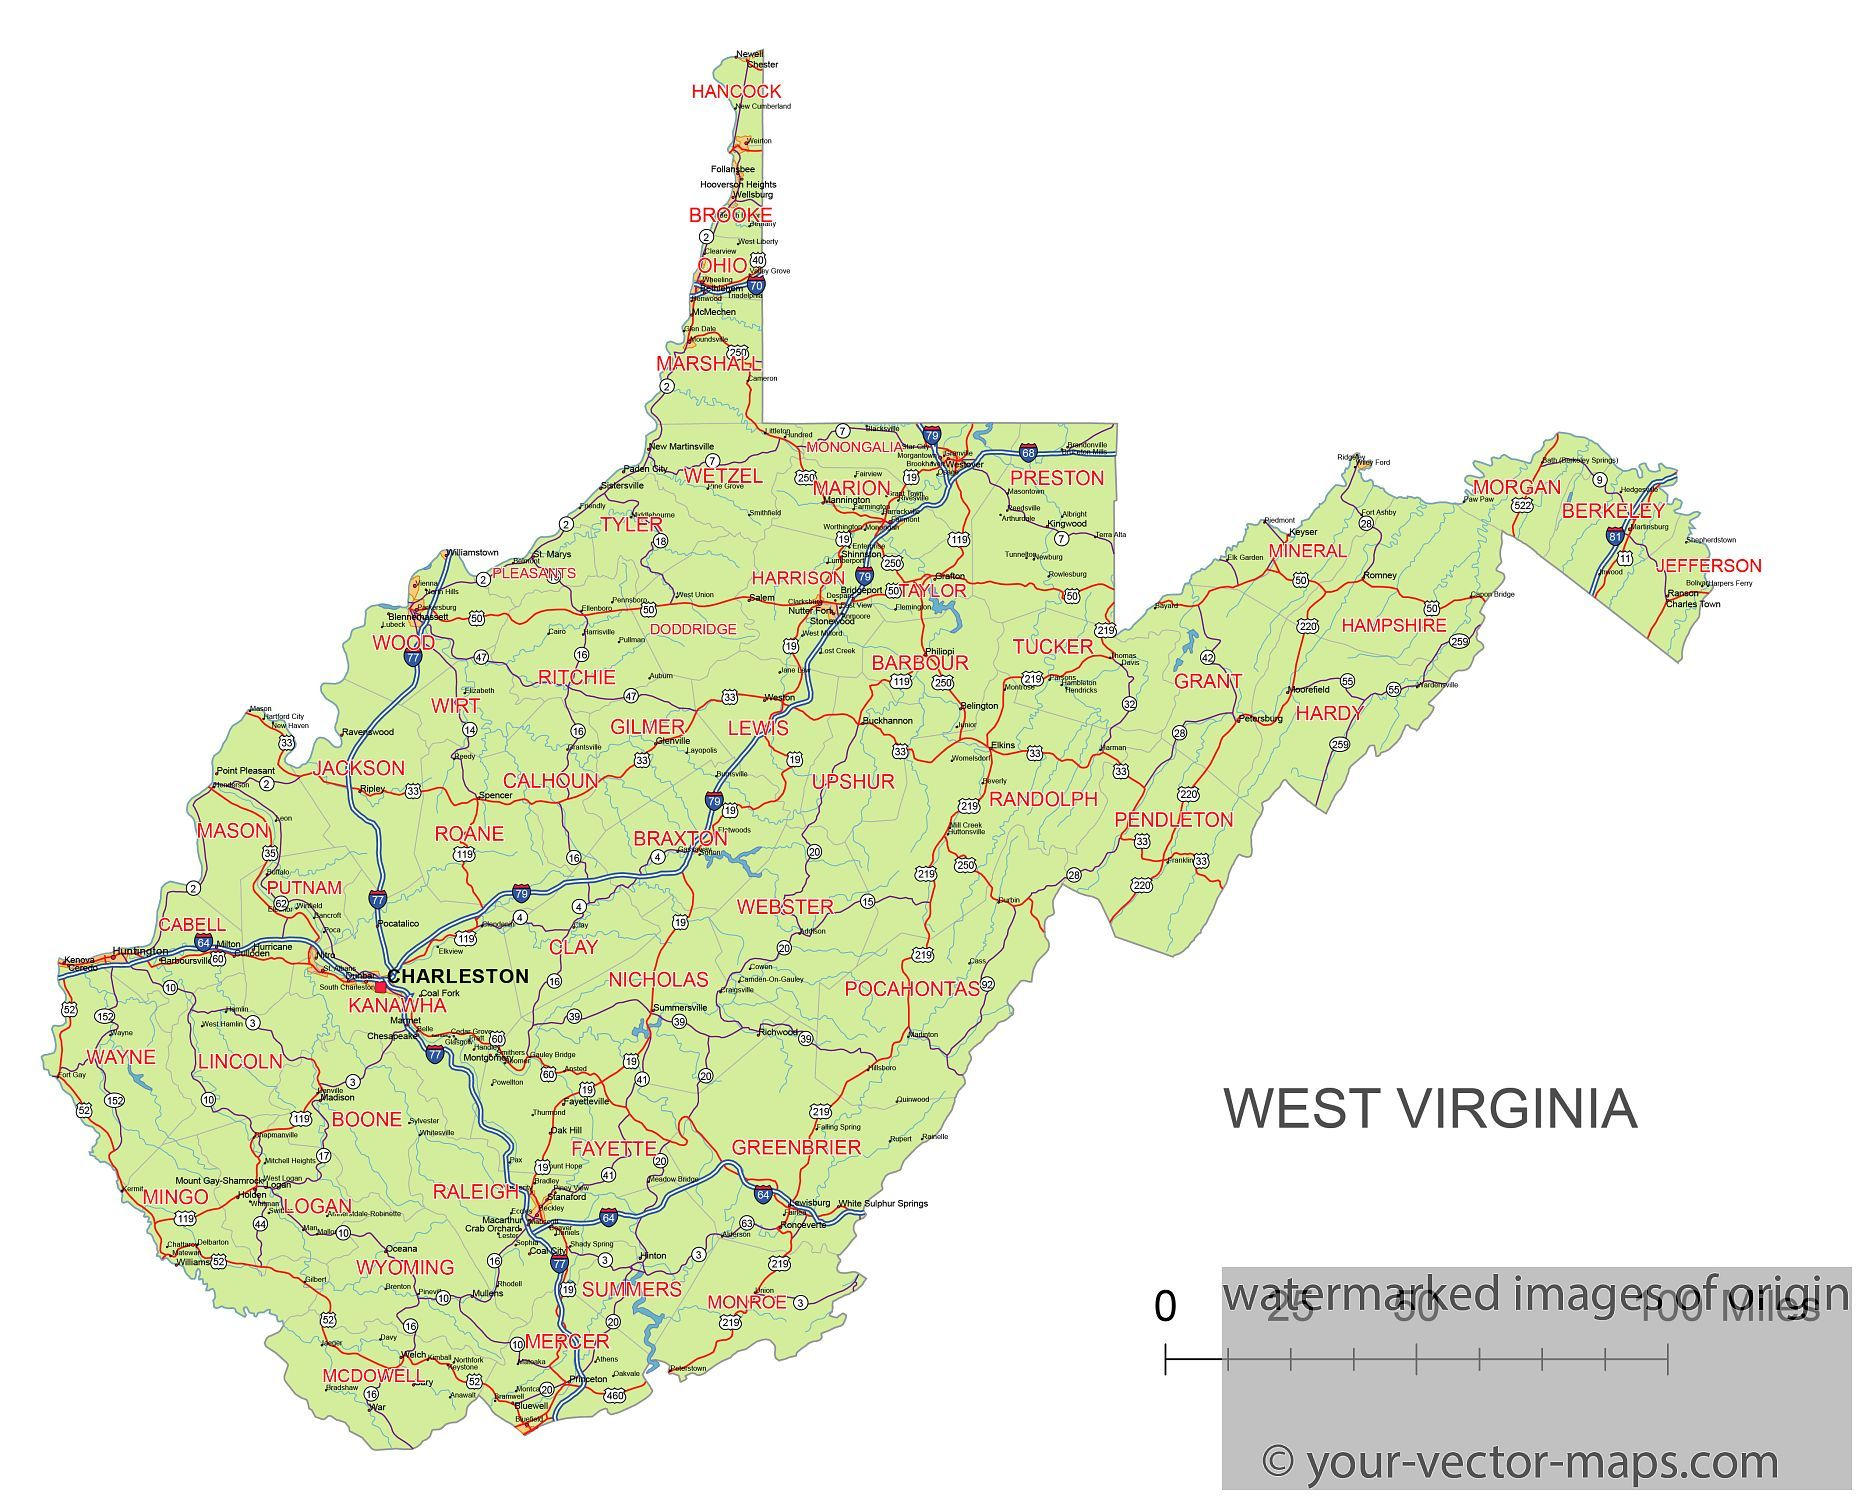 West Virginia Maps Showing Counties Roads Highways